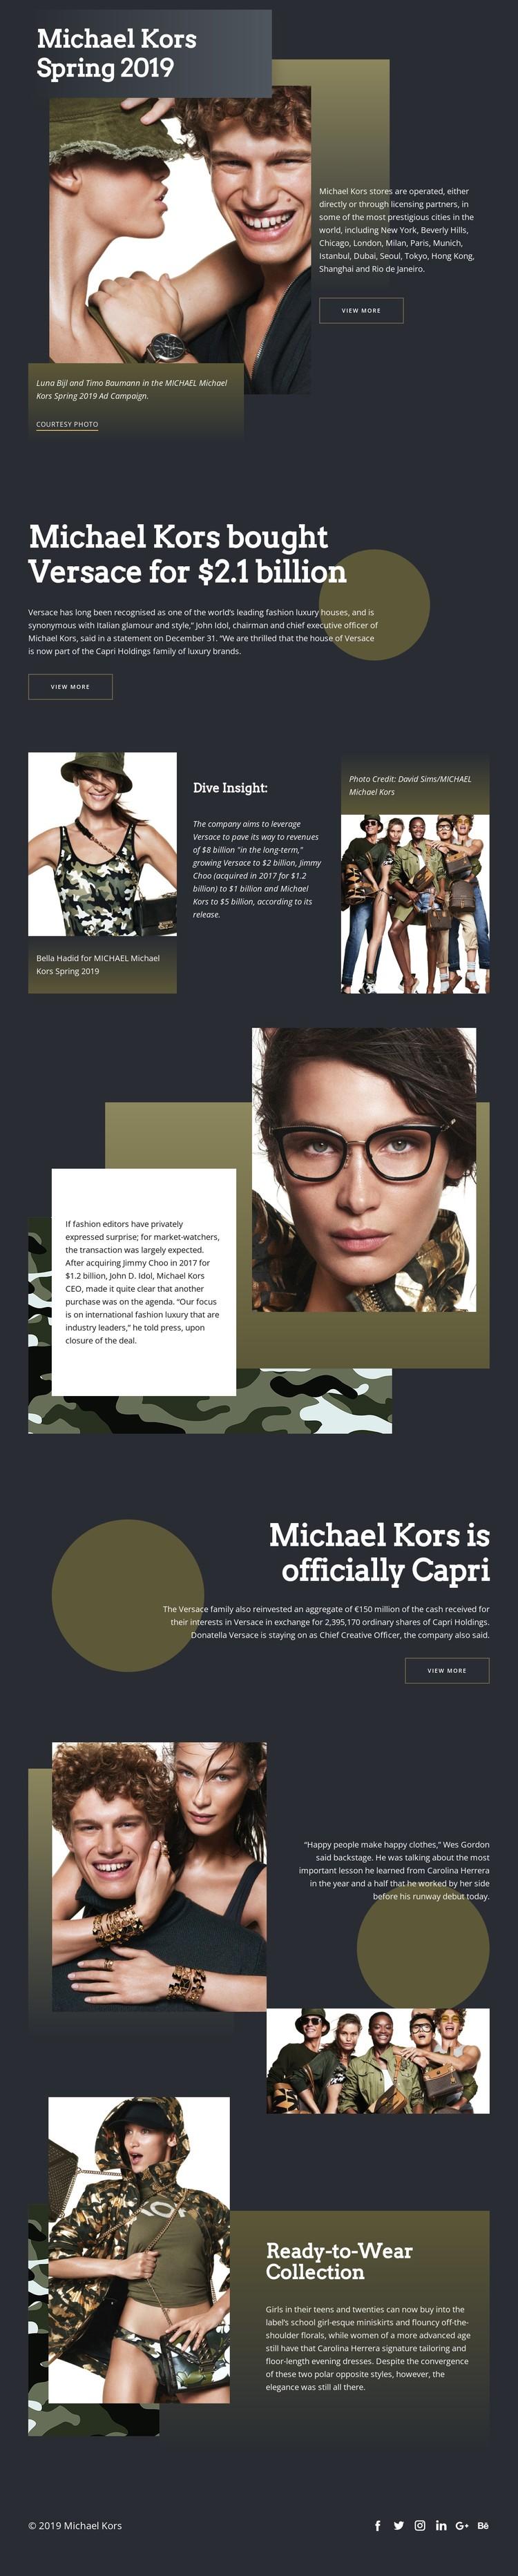 Michael Kors Dark CSS Template